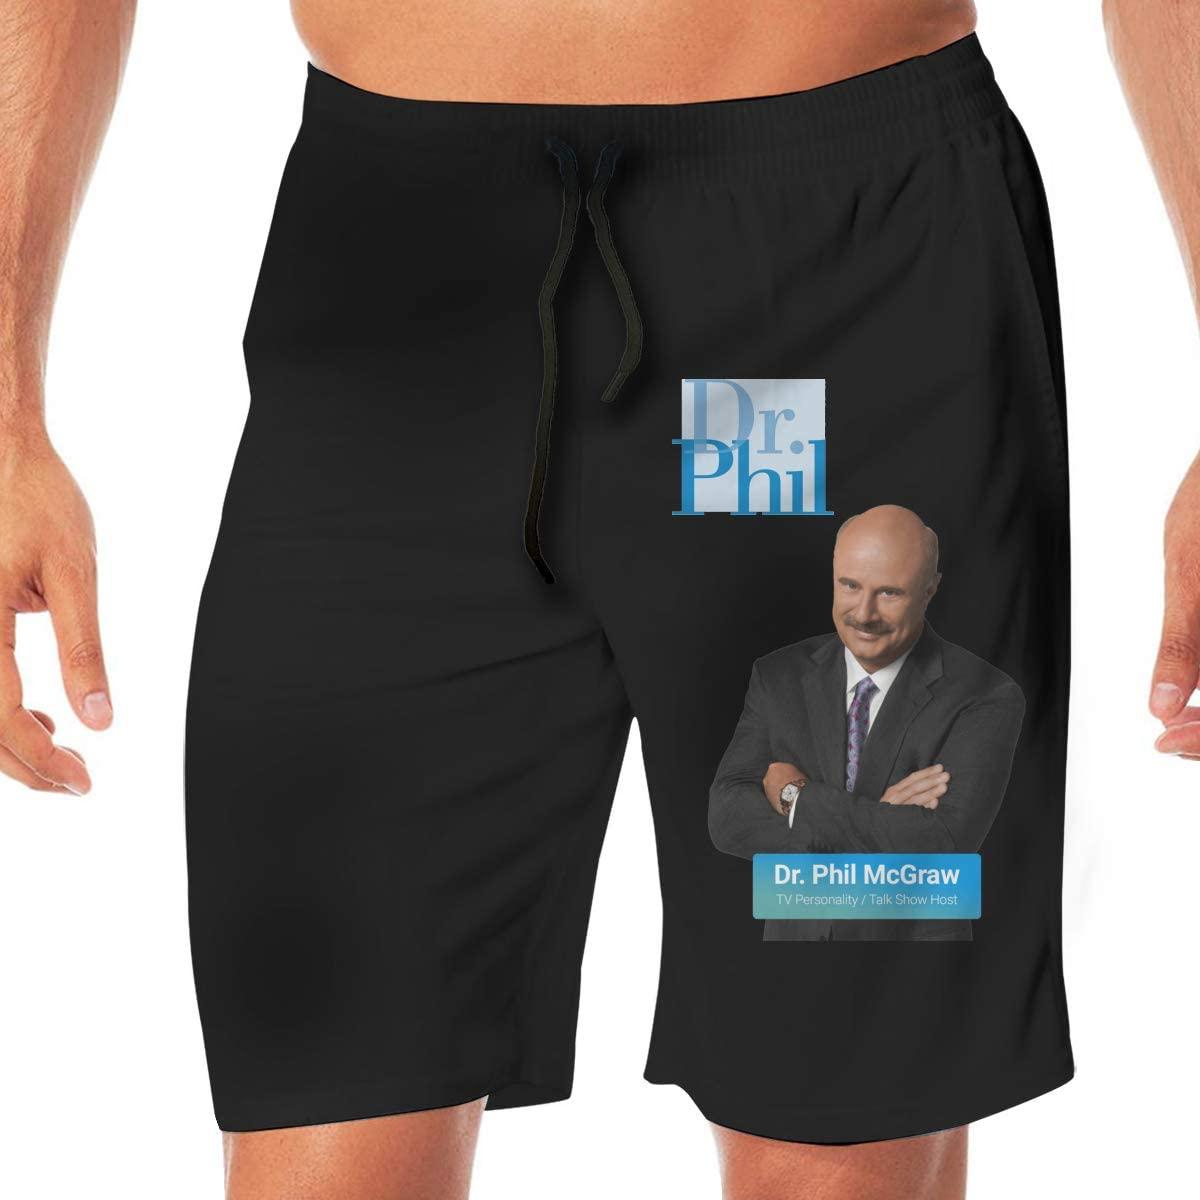 Dr Phil Beach Shorts for Men Swim Trunks Swimwear Boardshorts Summer Suits